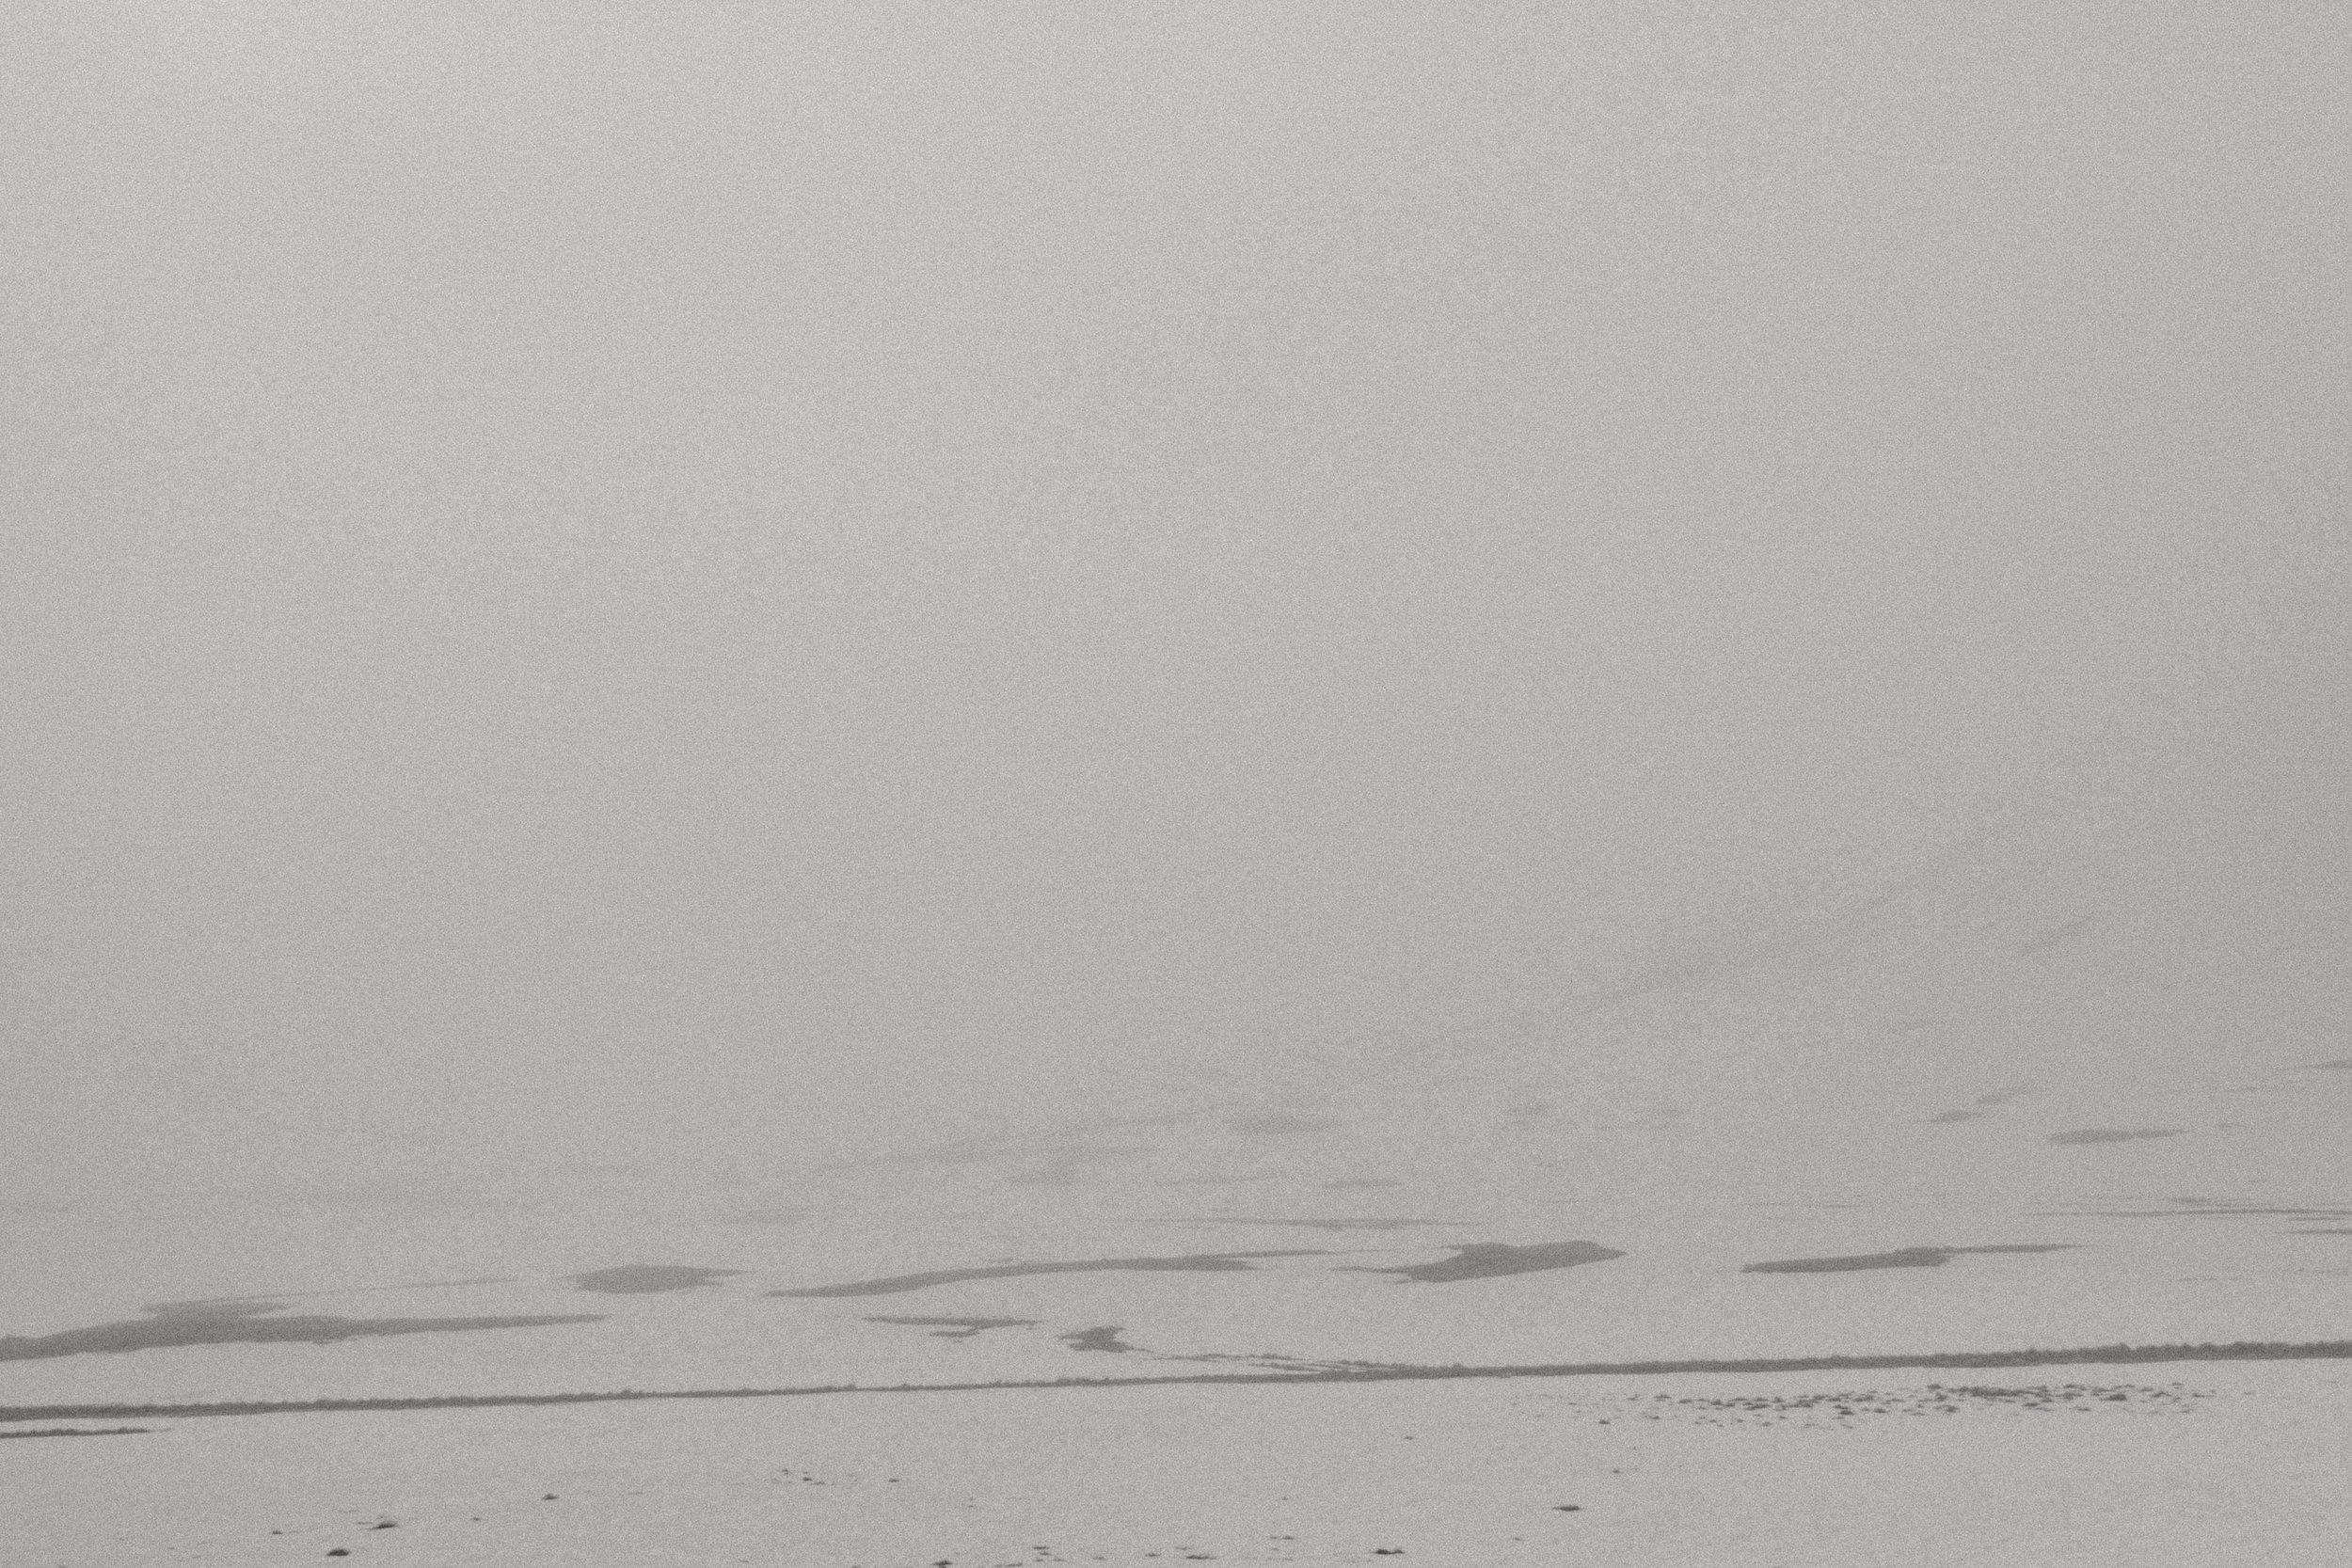 Iceland-honeymoon-4255.jpg